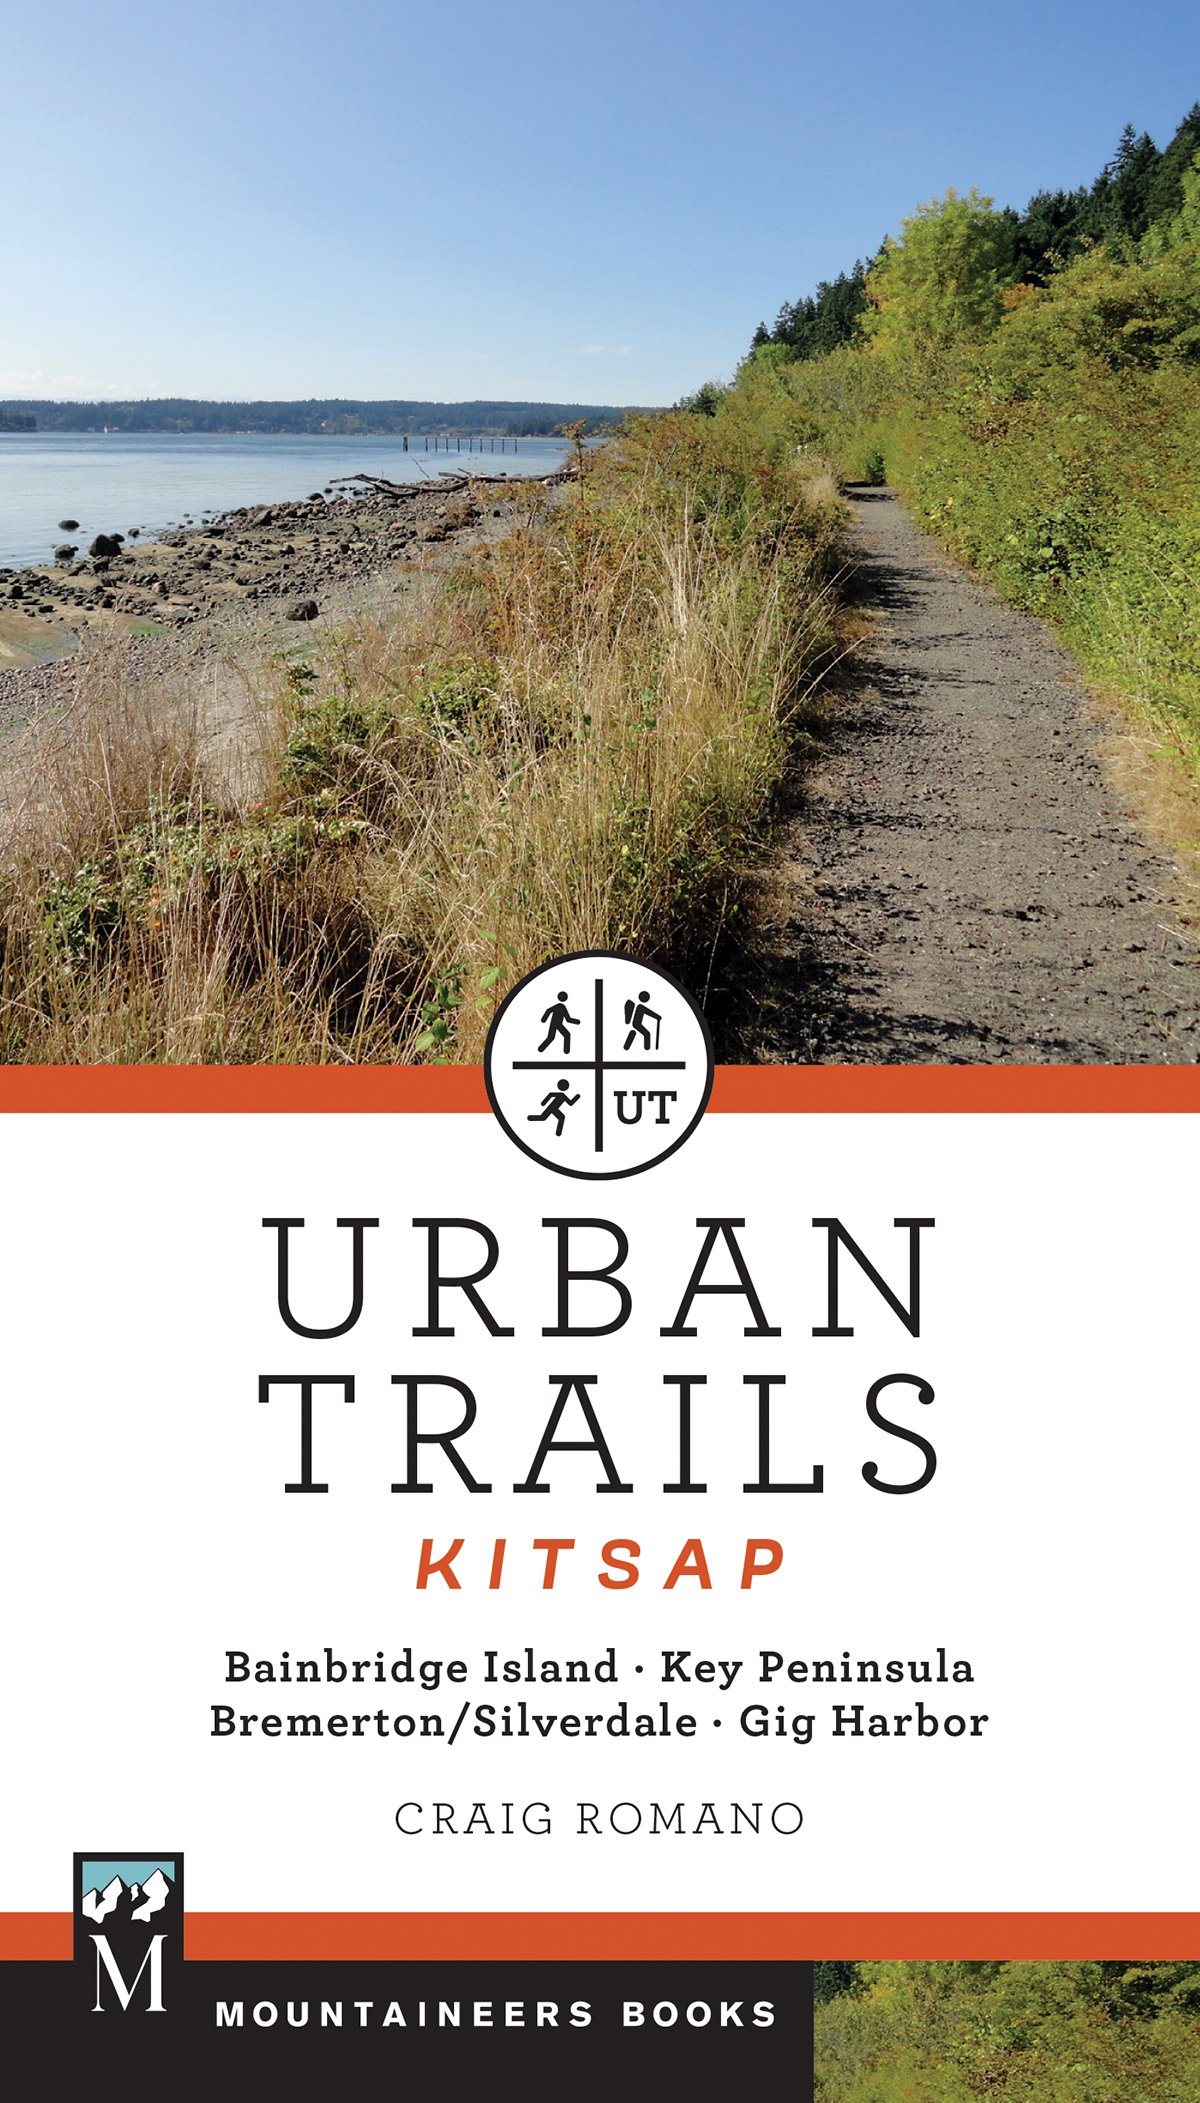 Urban Trails Kitsap Bainbridge Island Key Peninsula Bremerton